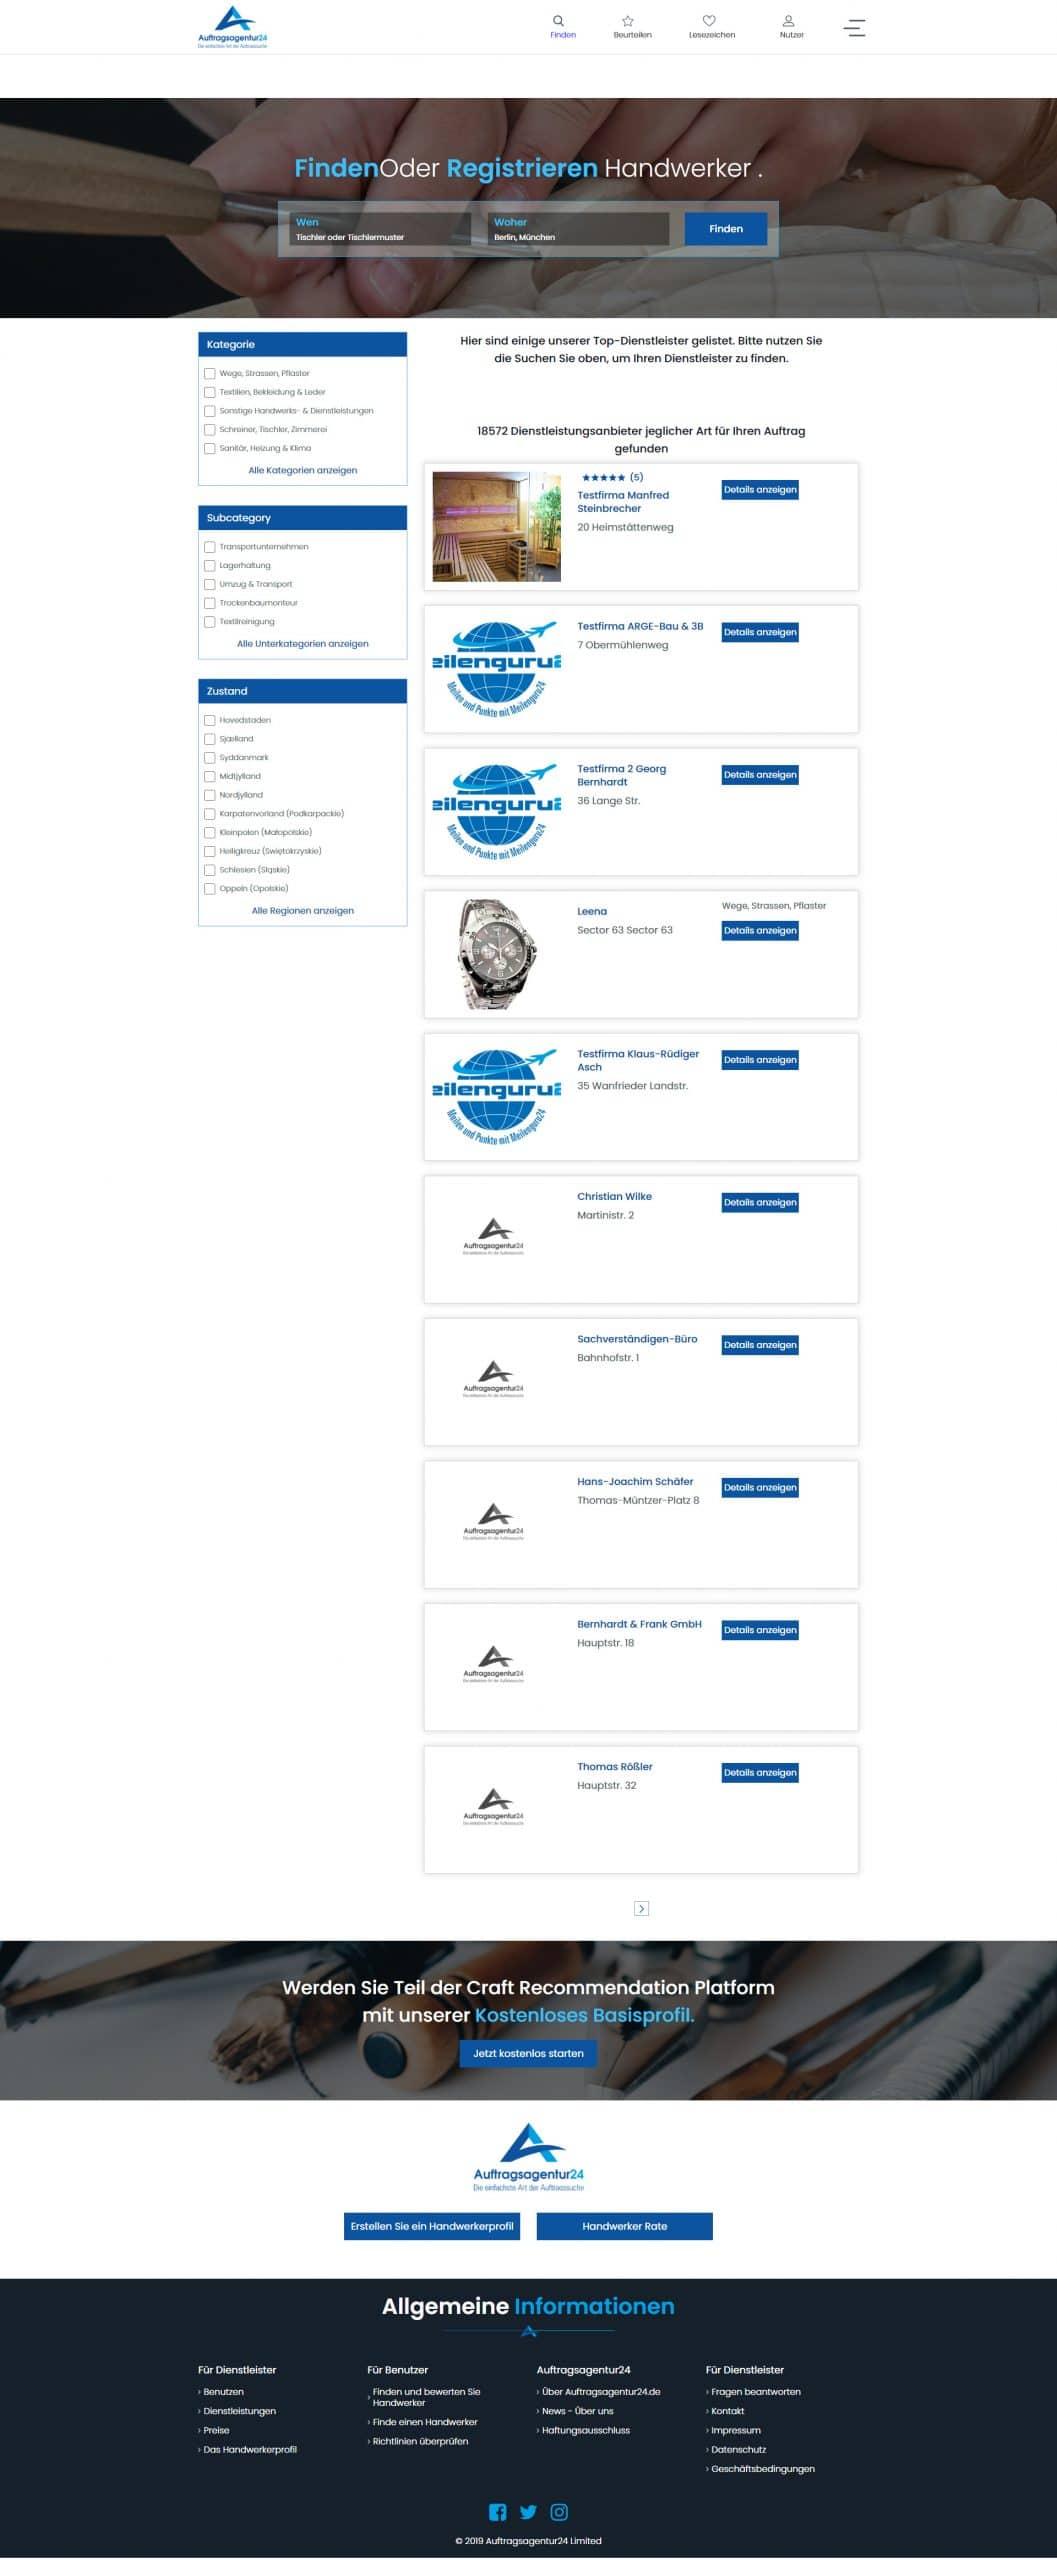 market-place-website-development-company-germany-1-scaled